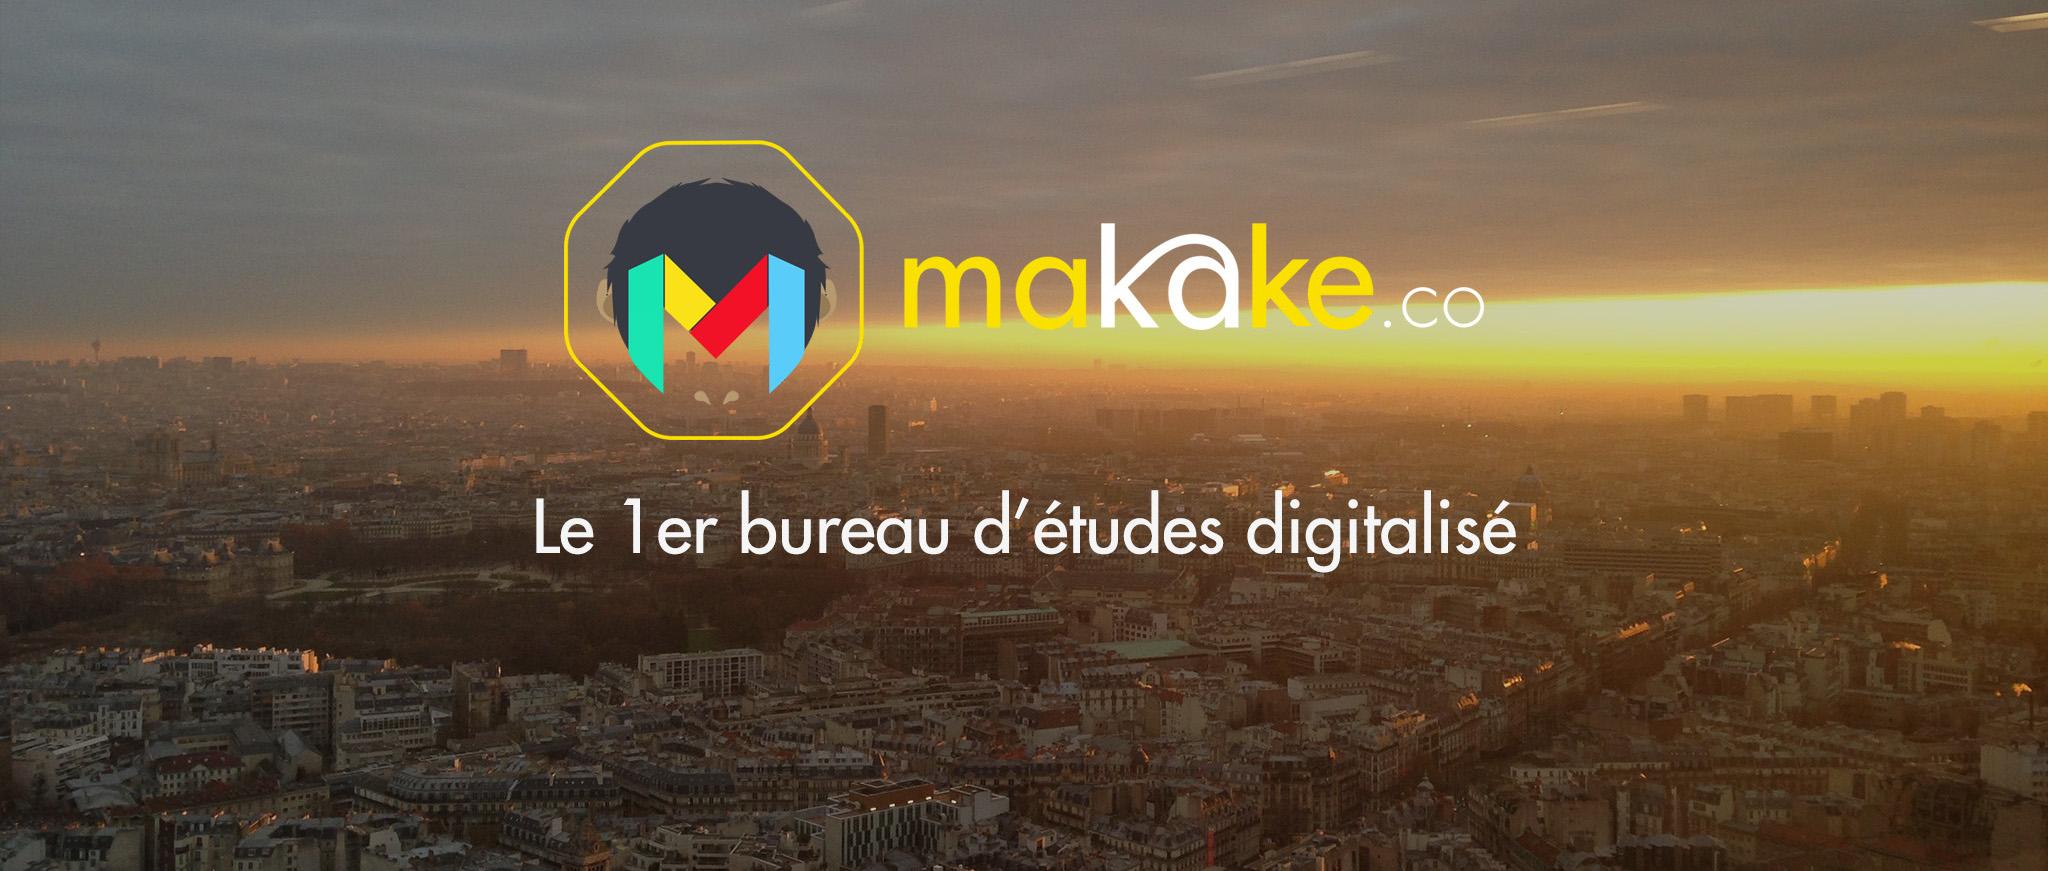 Makake - copie